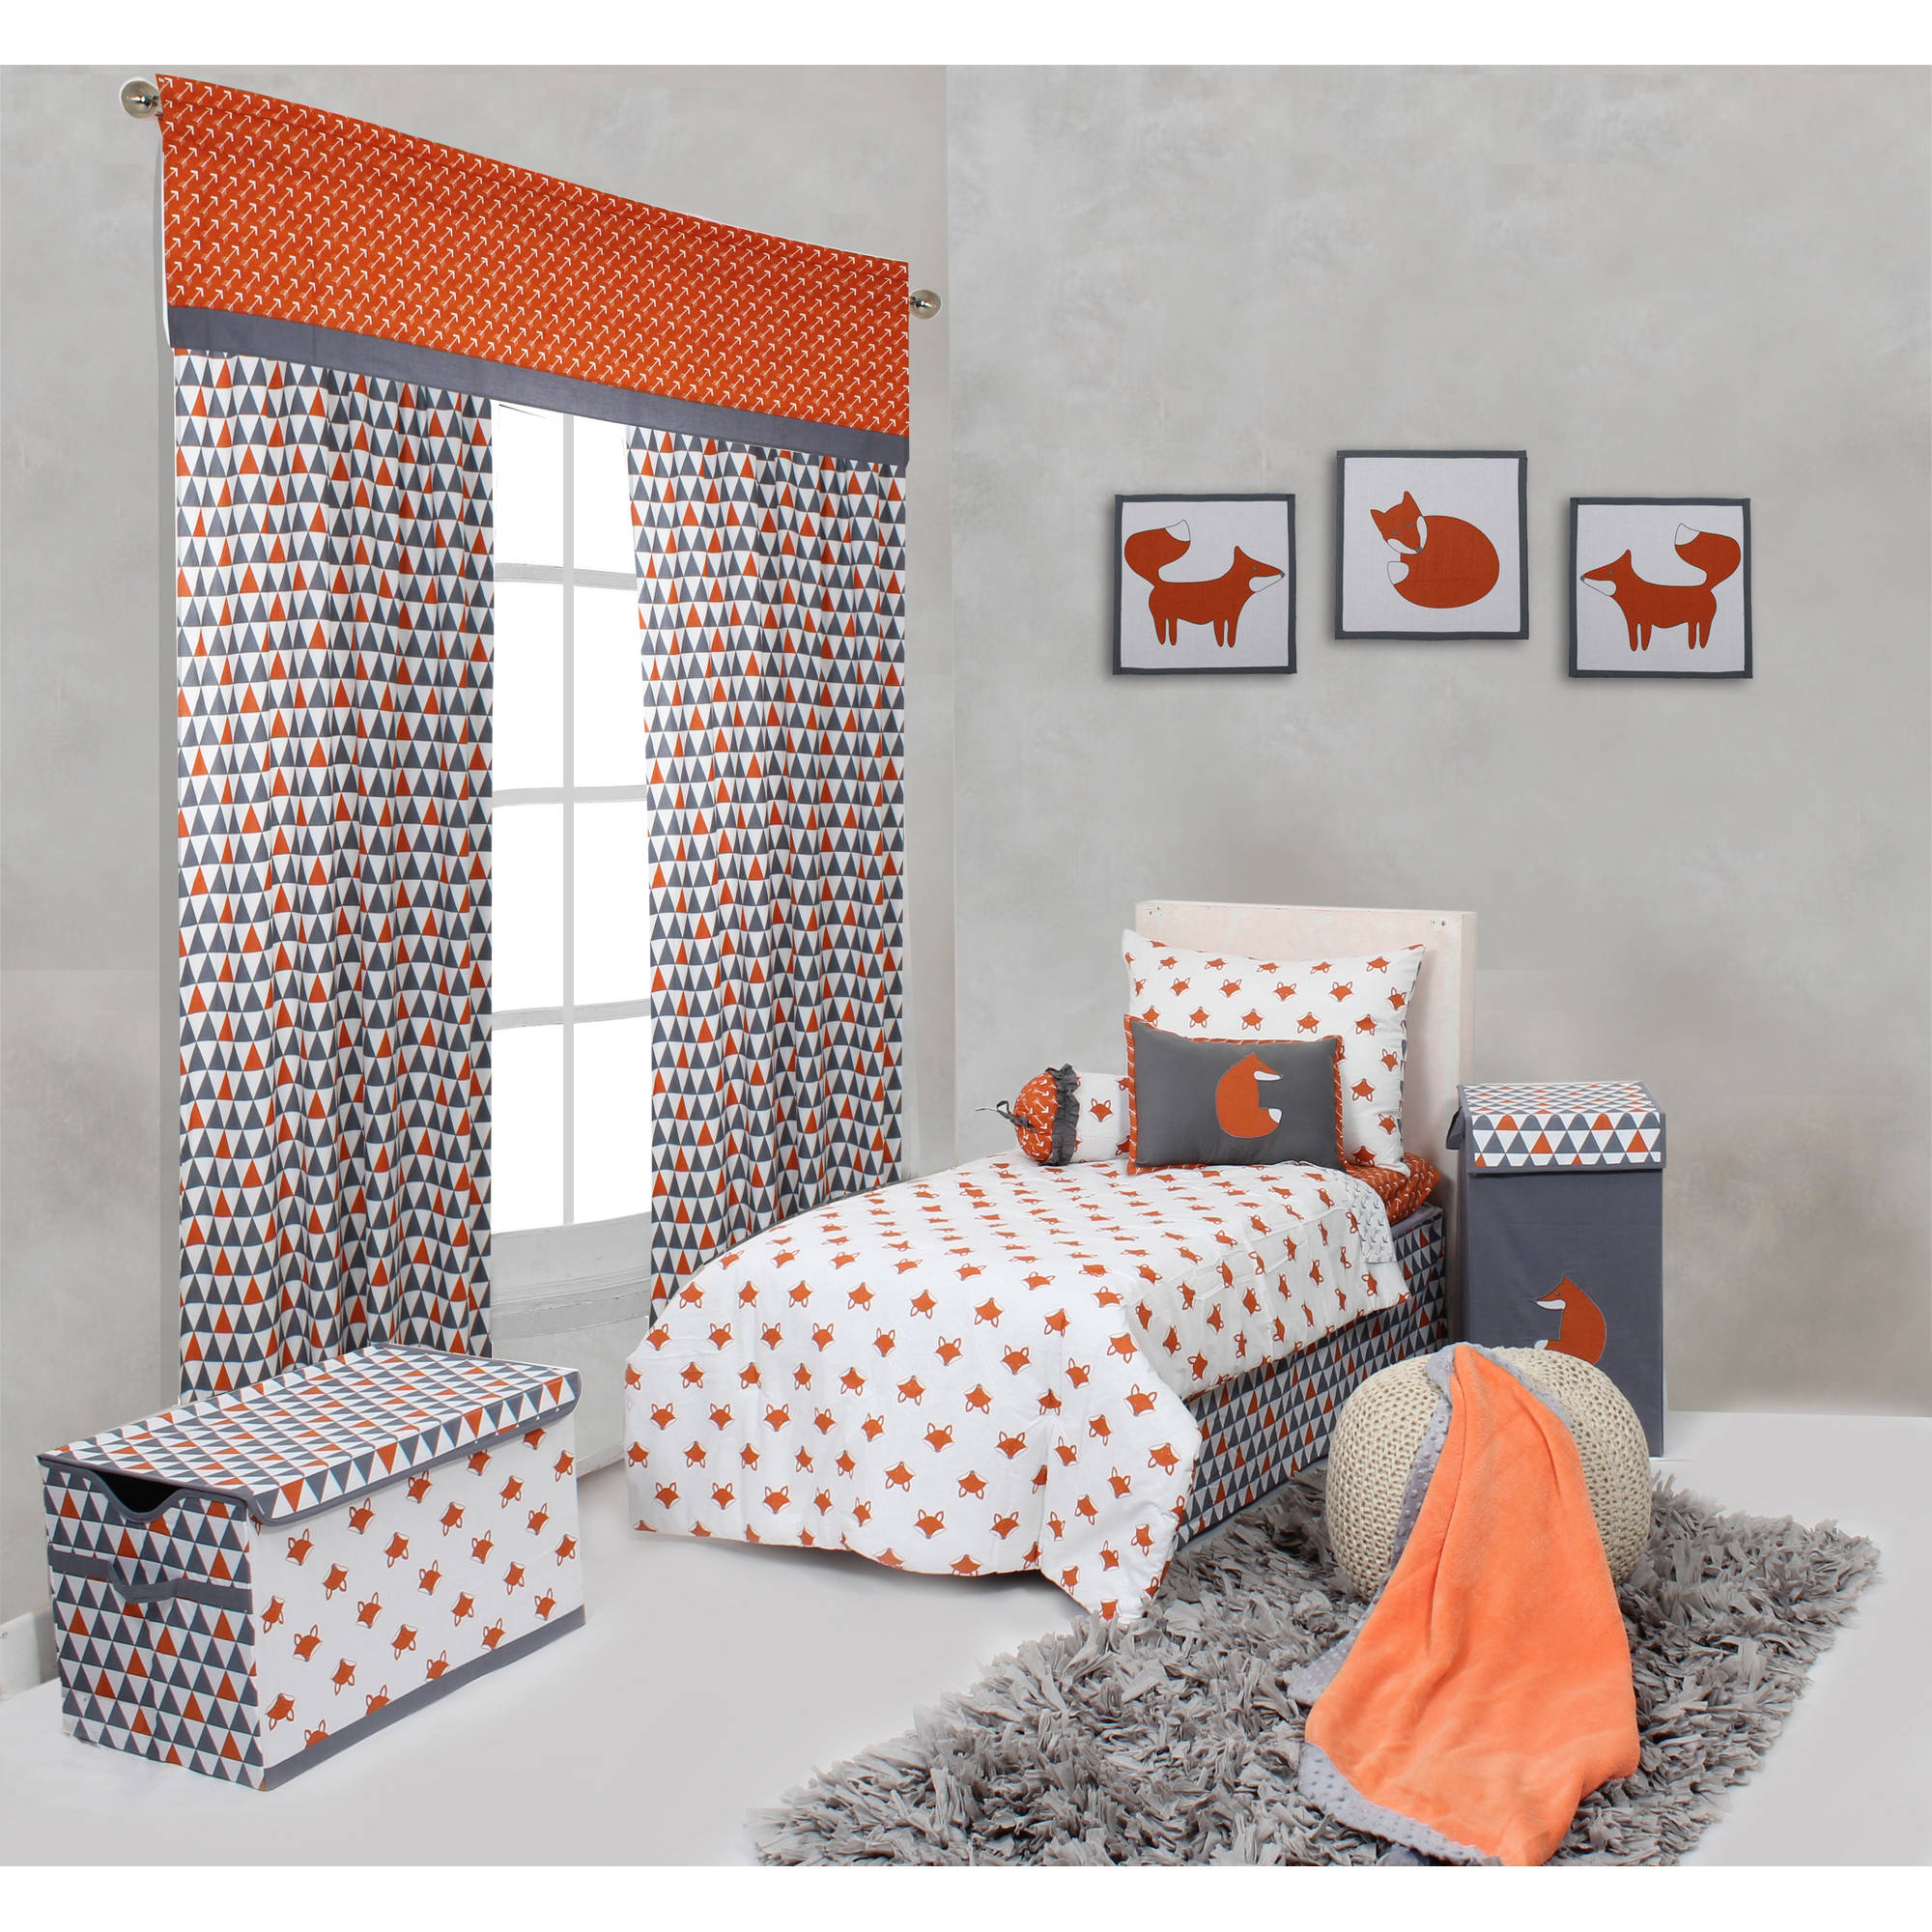 Bacati - Playful Foxes Orange/Gray 4-Piece Toddler Bedding Set 100% Cotton percale fabrics